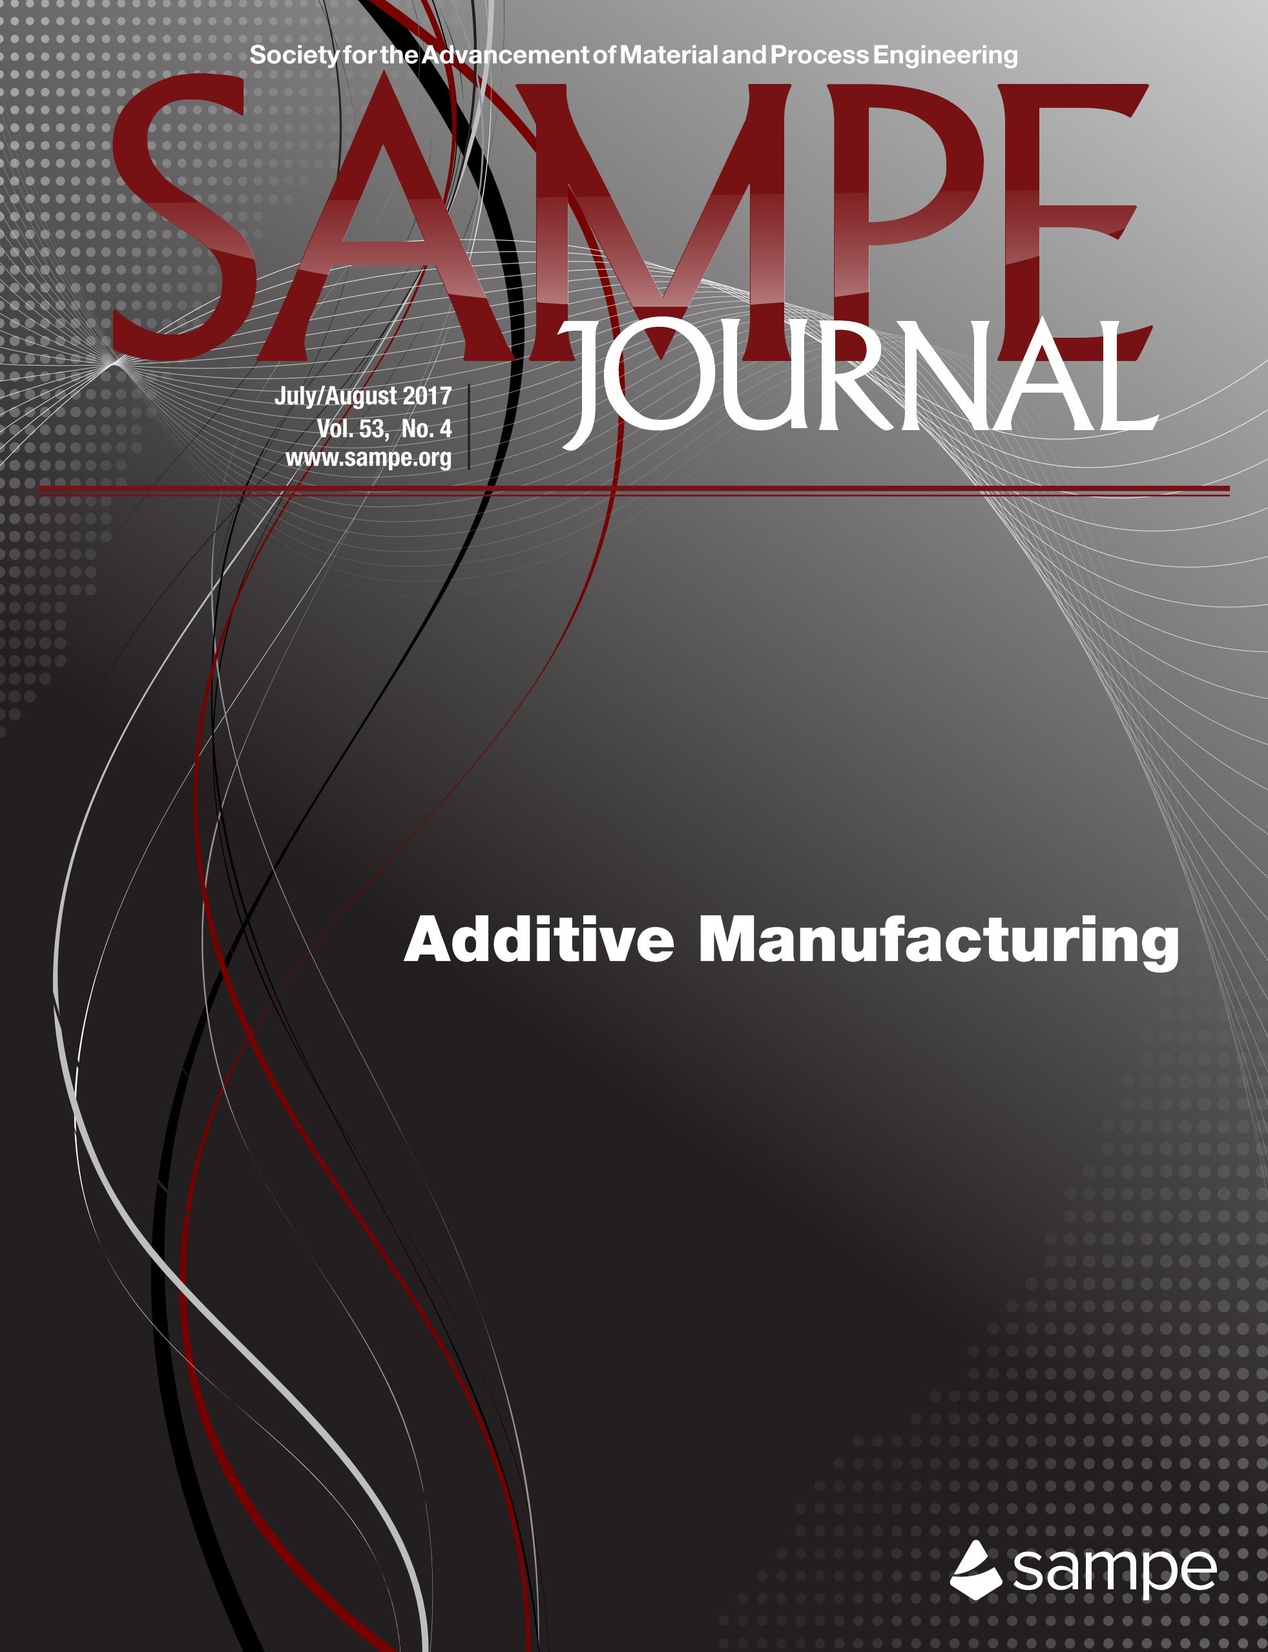 SAMPE Journal - July/August 2017